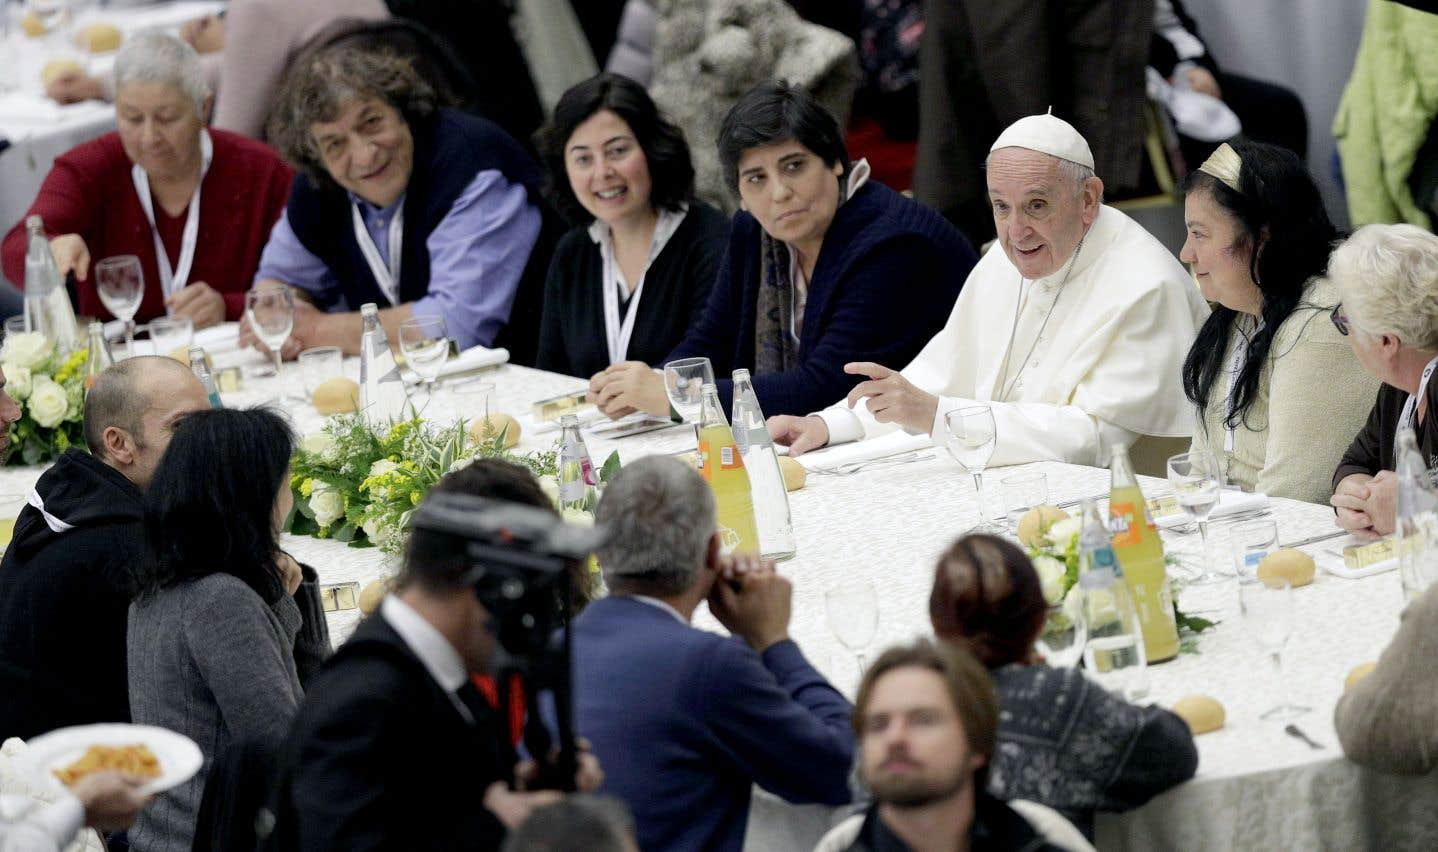 Le Vatican s'improvise resto populaire